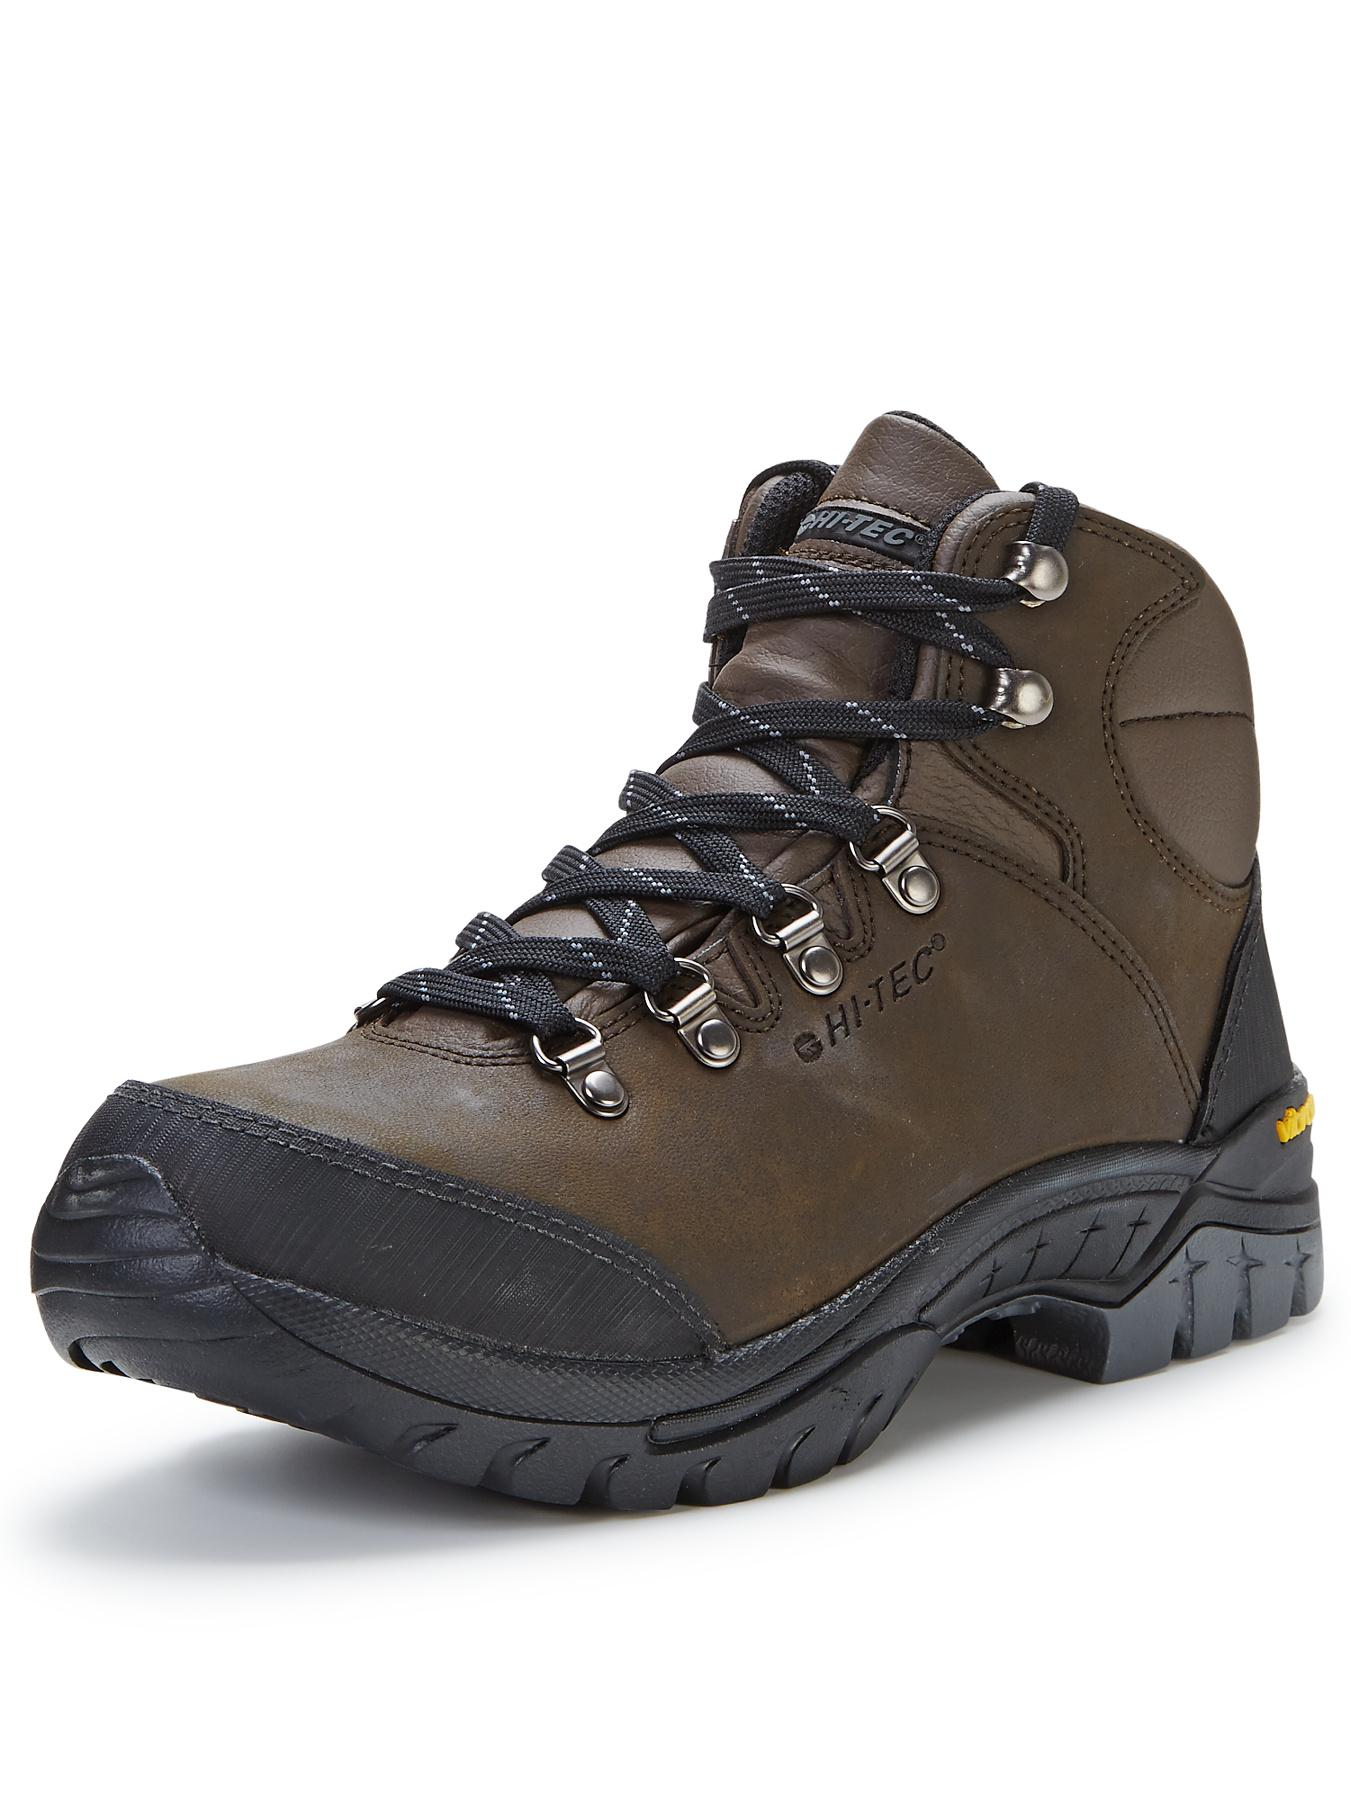 Jura Walking Boots, Brown at Littlewoods